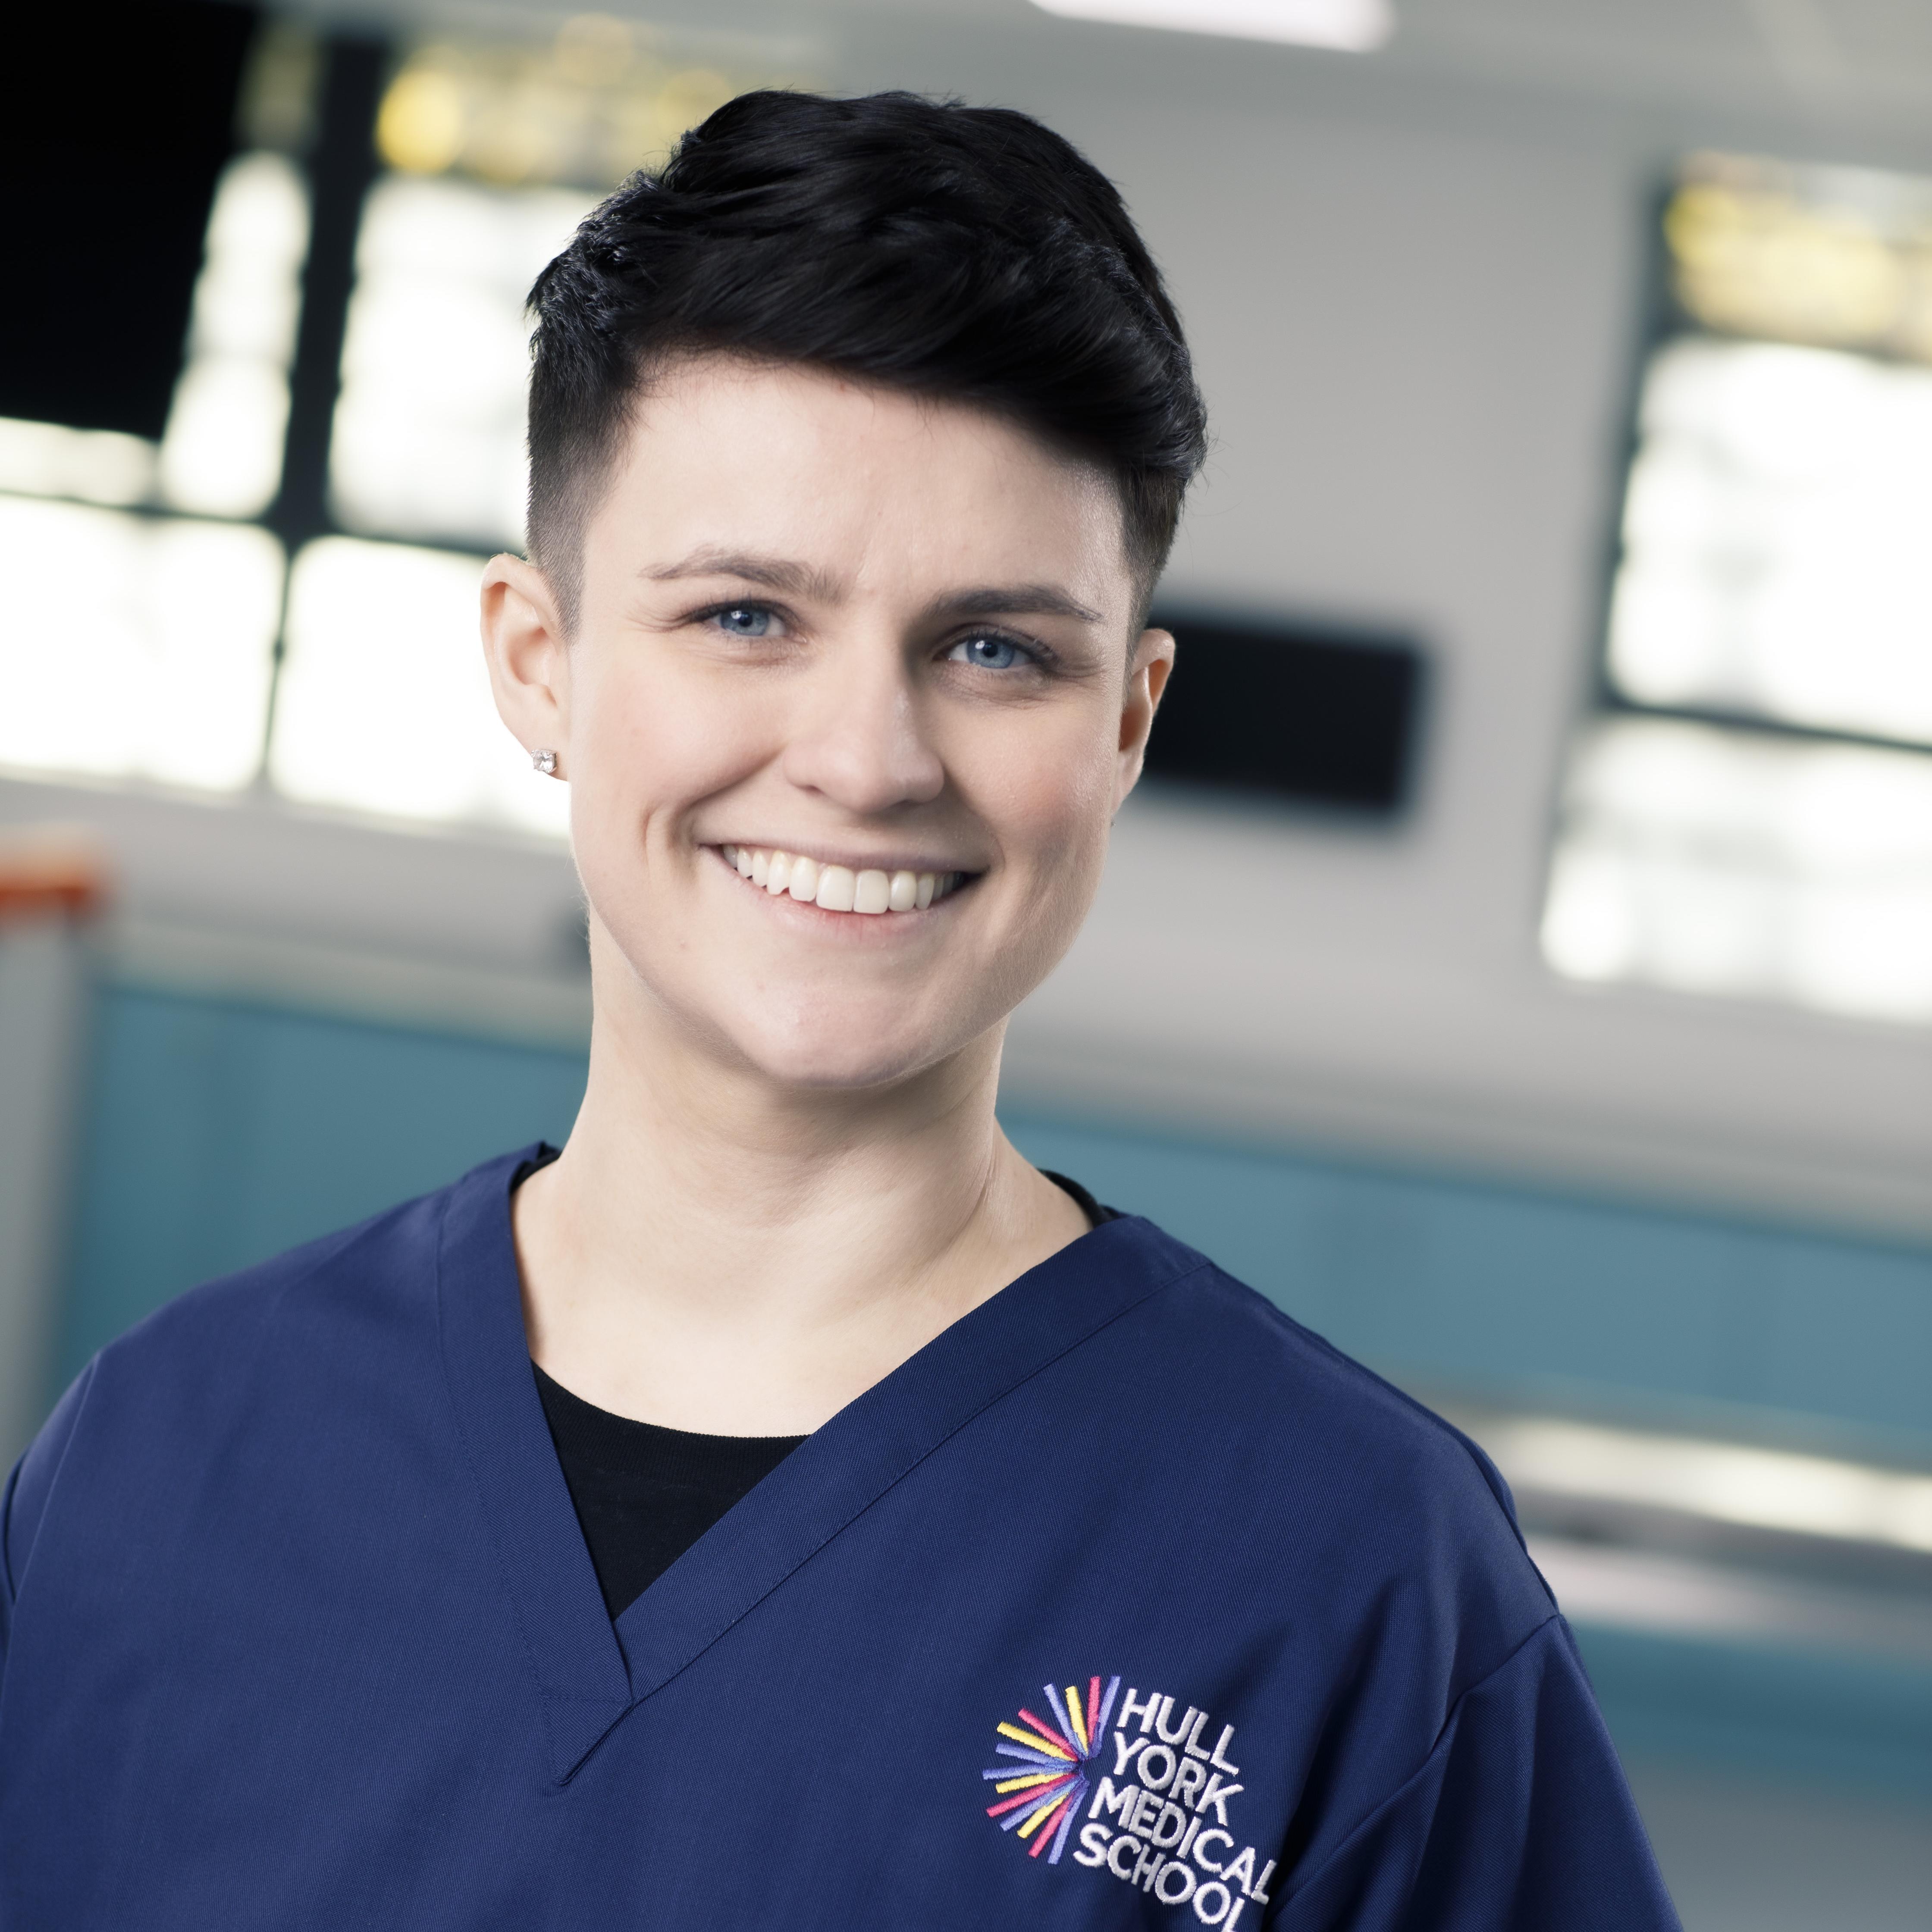 Dr Kat Sanders